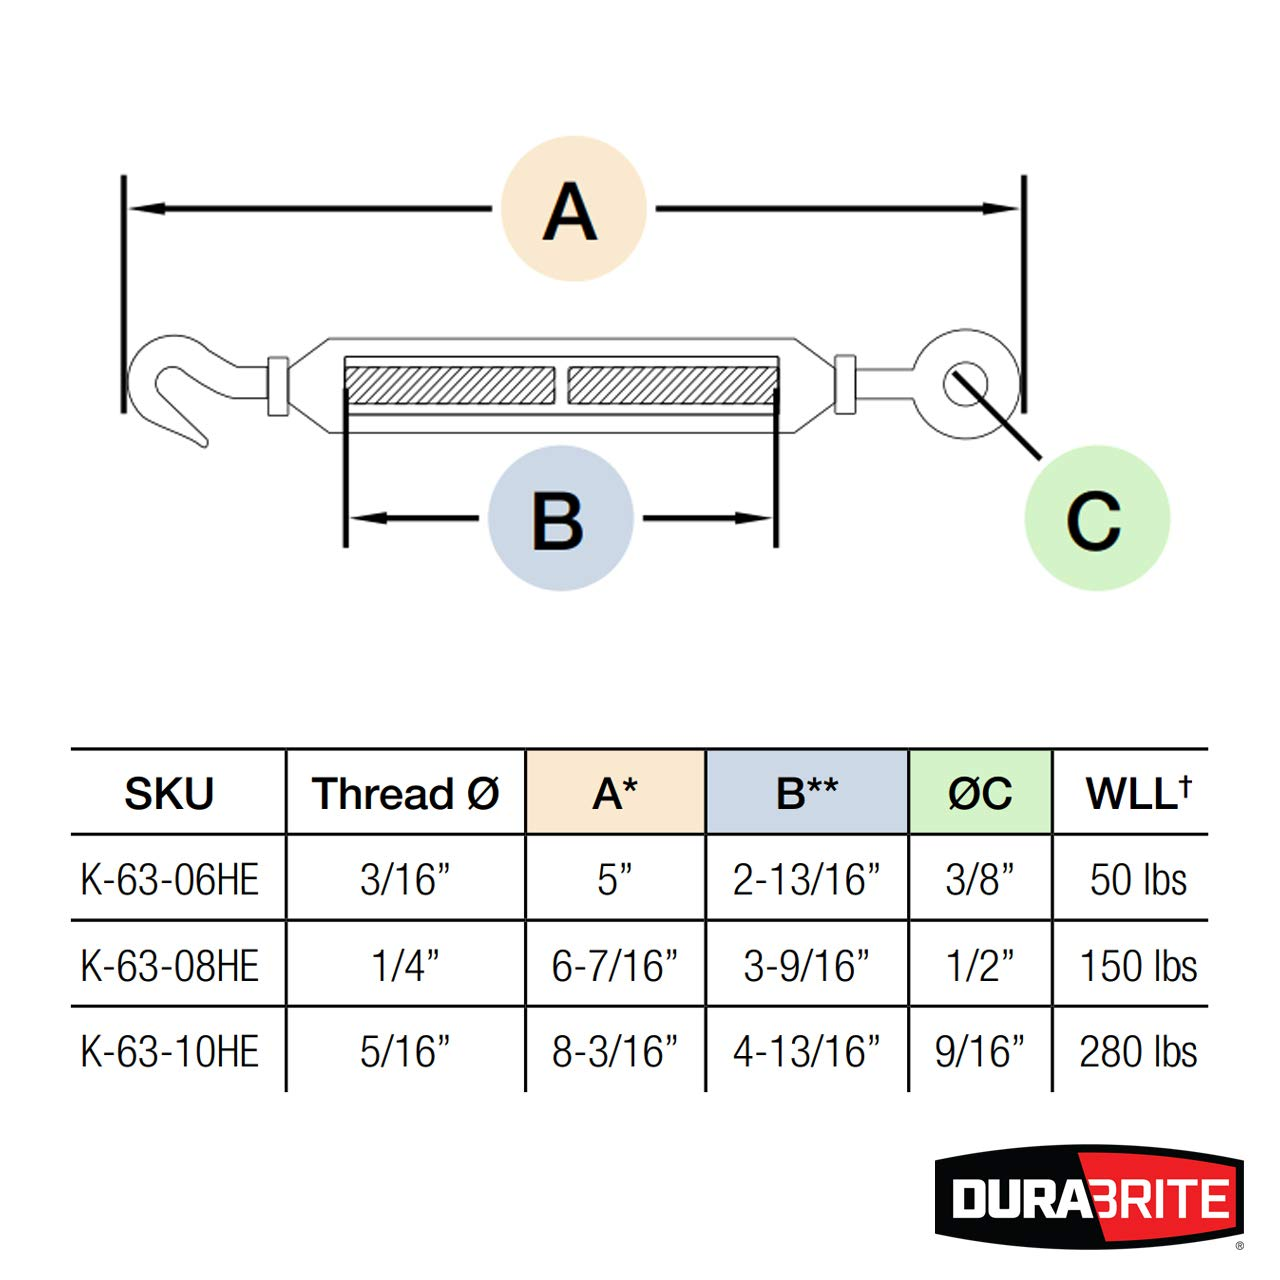 DuraBrite 316 Stainless Steel Hook & Eye Turnbuckle 5/16'' Marine Grade - 5 Pcs